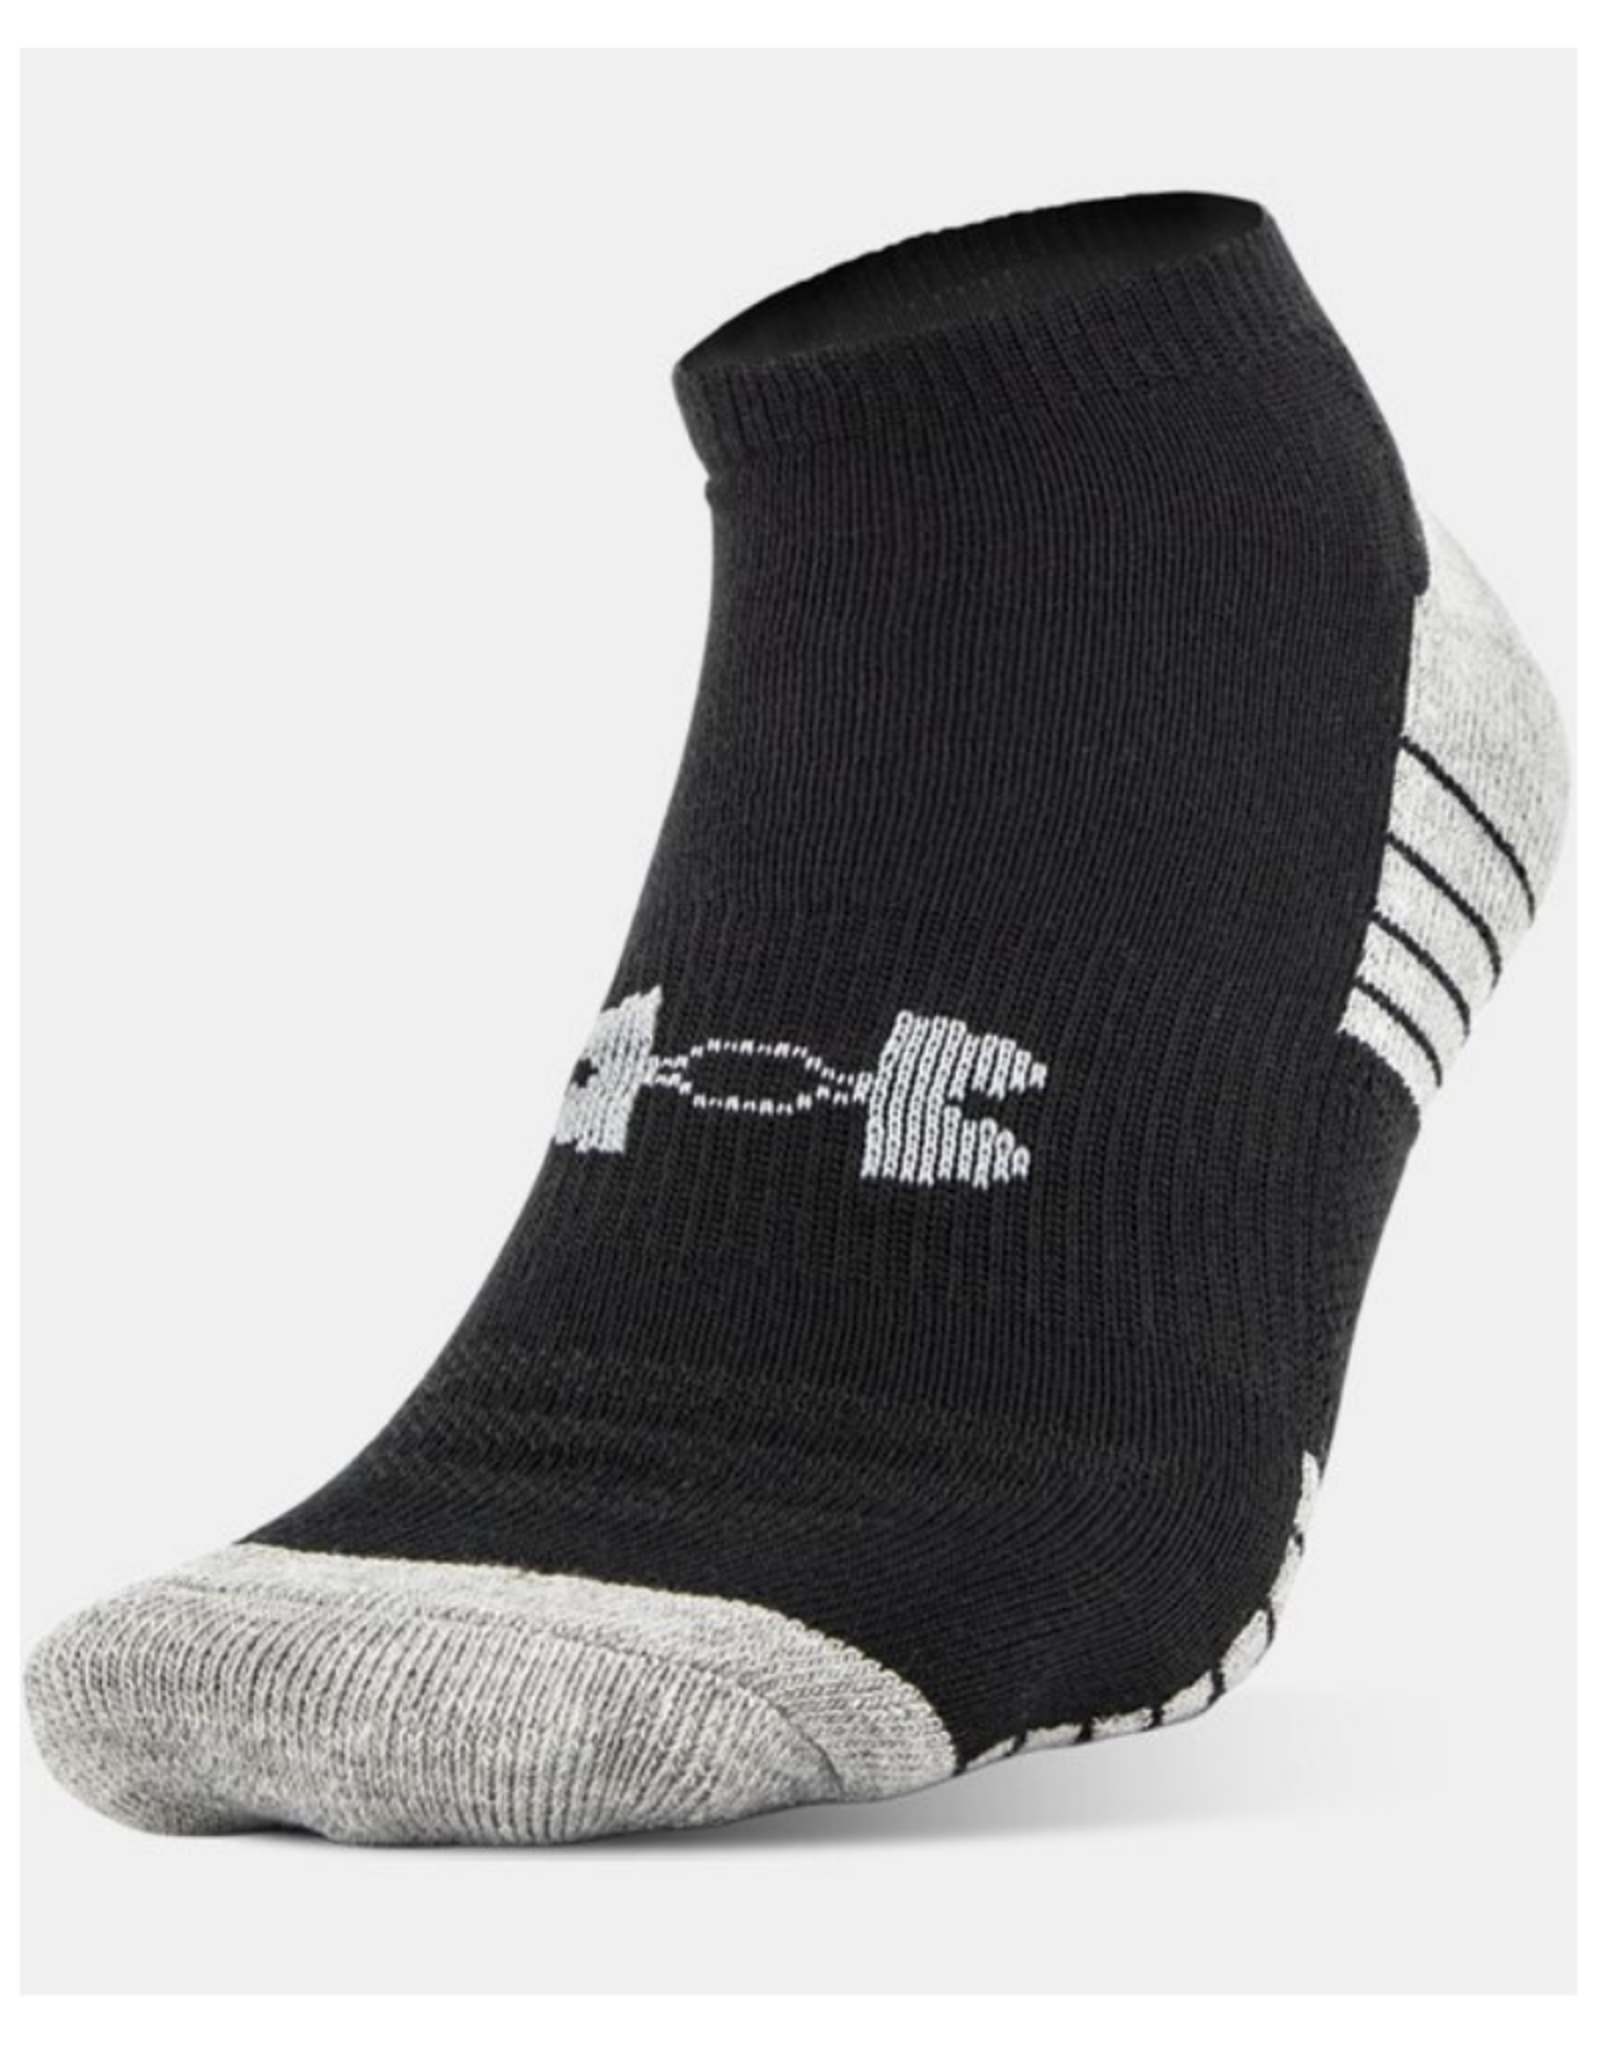 Under Armour Men's Ankle Sock 3 Pack Black